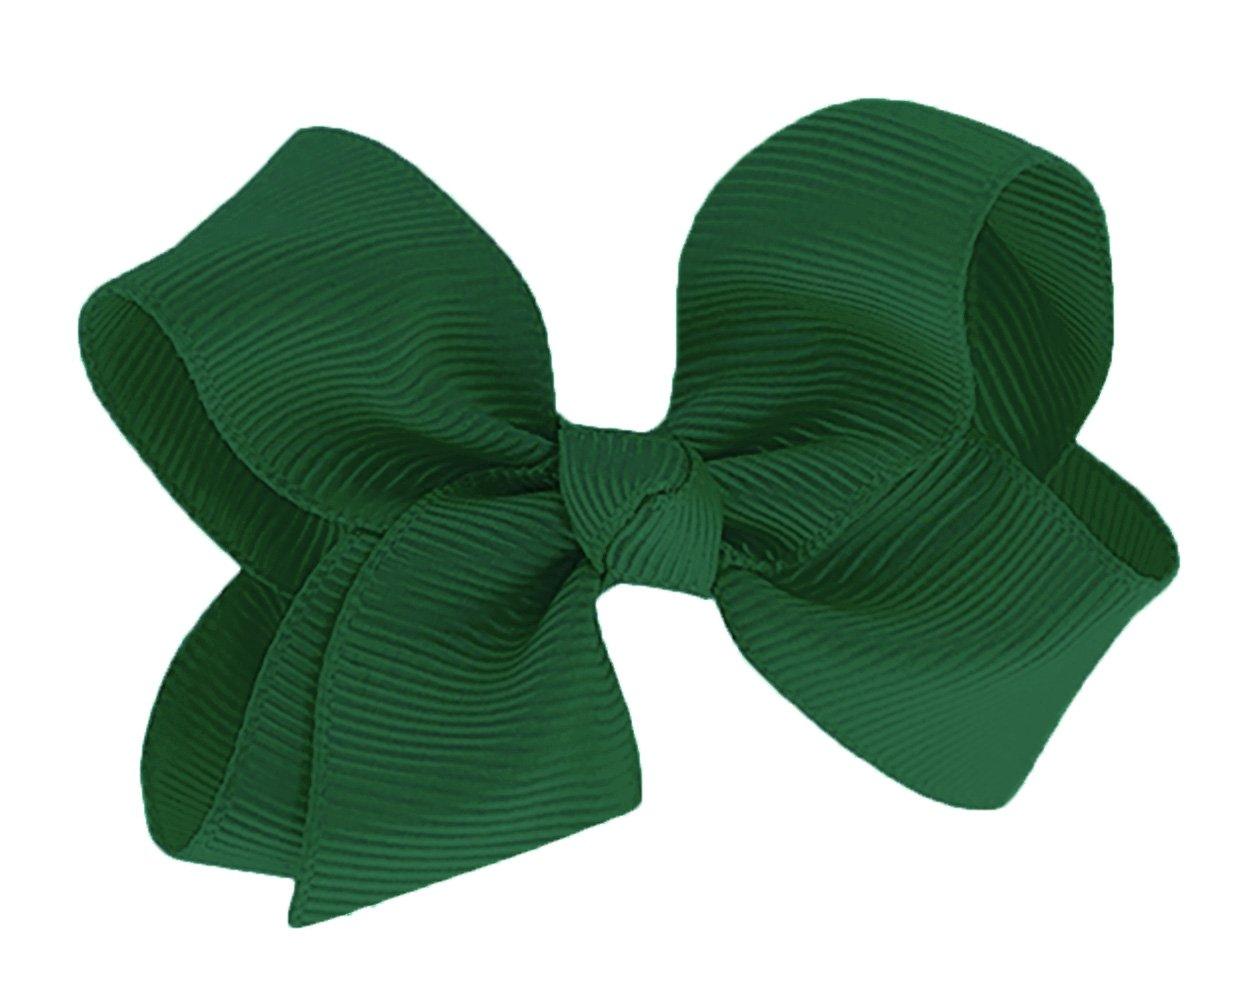 WD2U Baby Girls 3 by 2 GrosGrain Knotted Boutique Hair Bow Alligator Clip USA Webb Direct 2U WD2U-1094A-Black